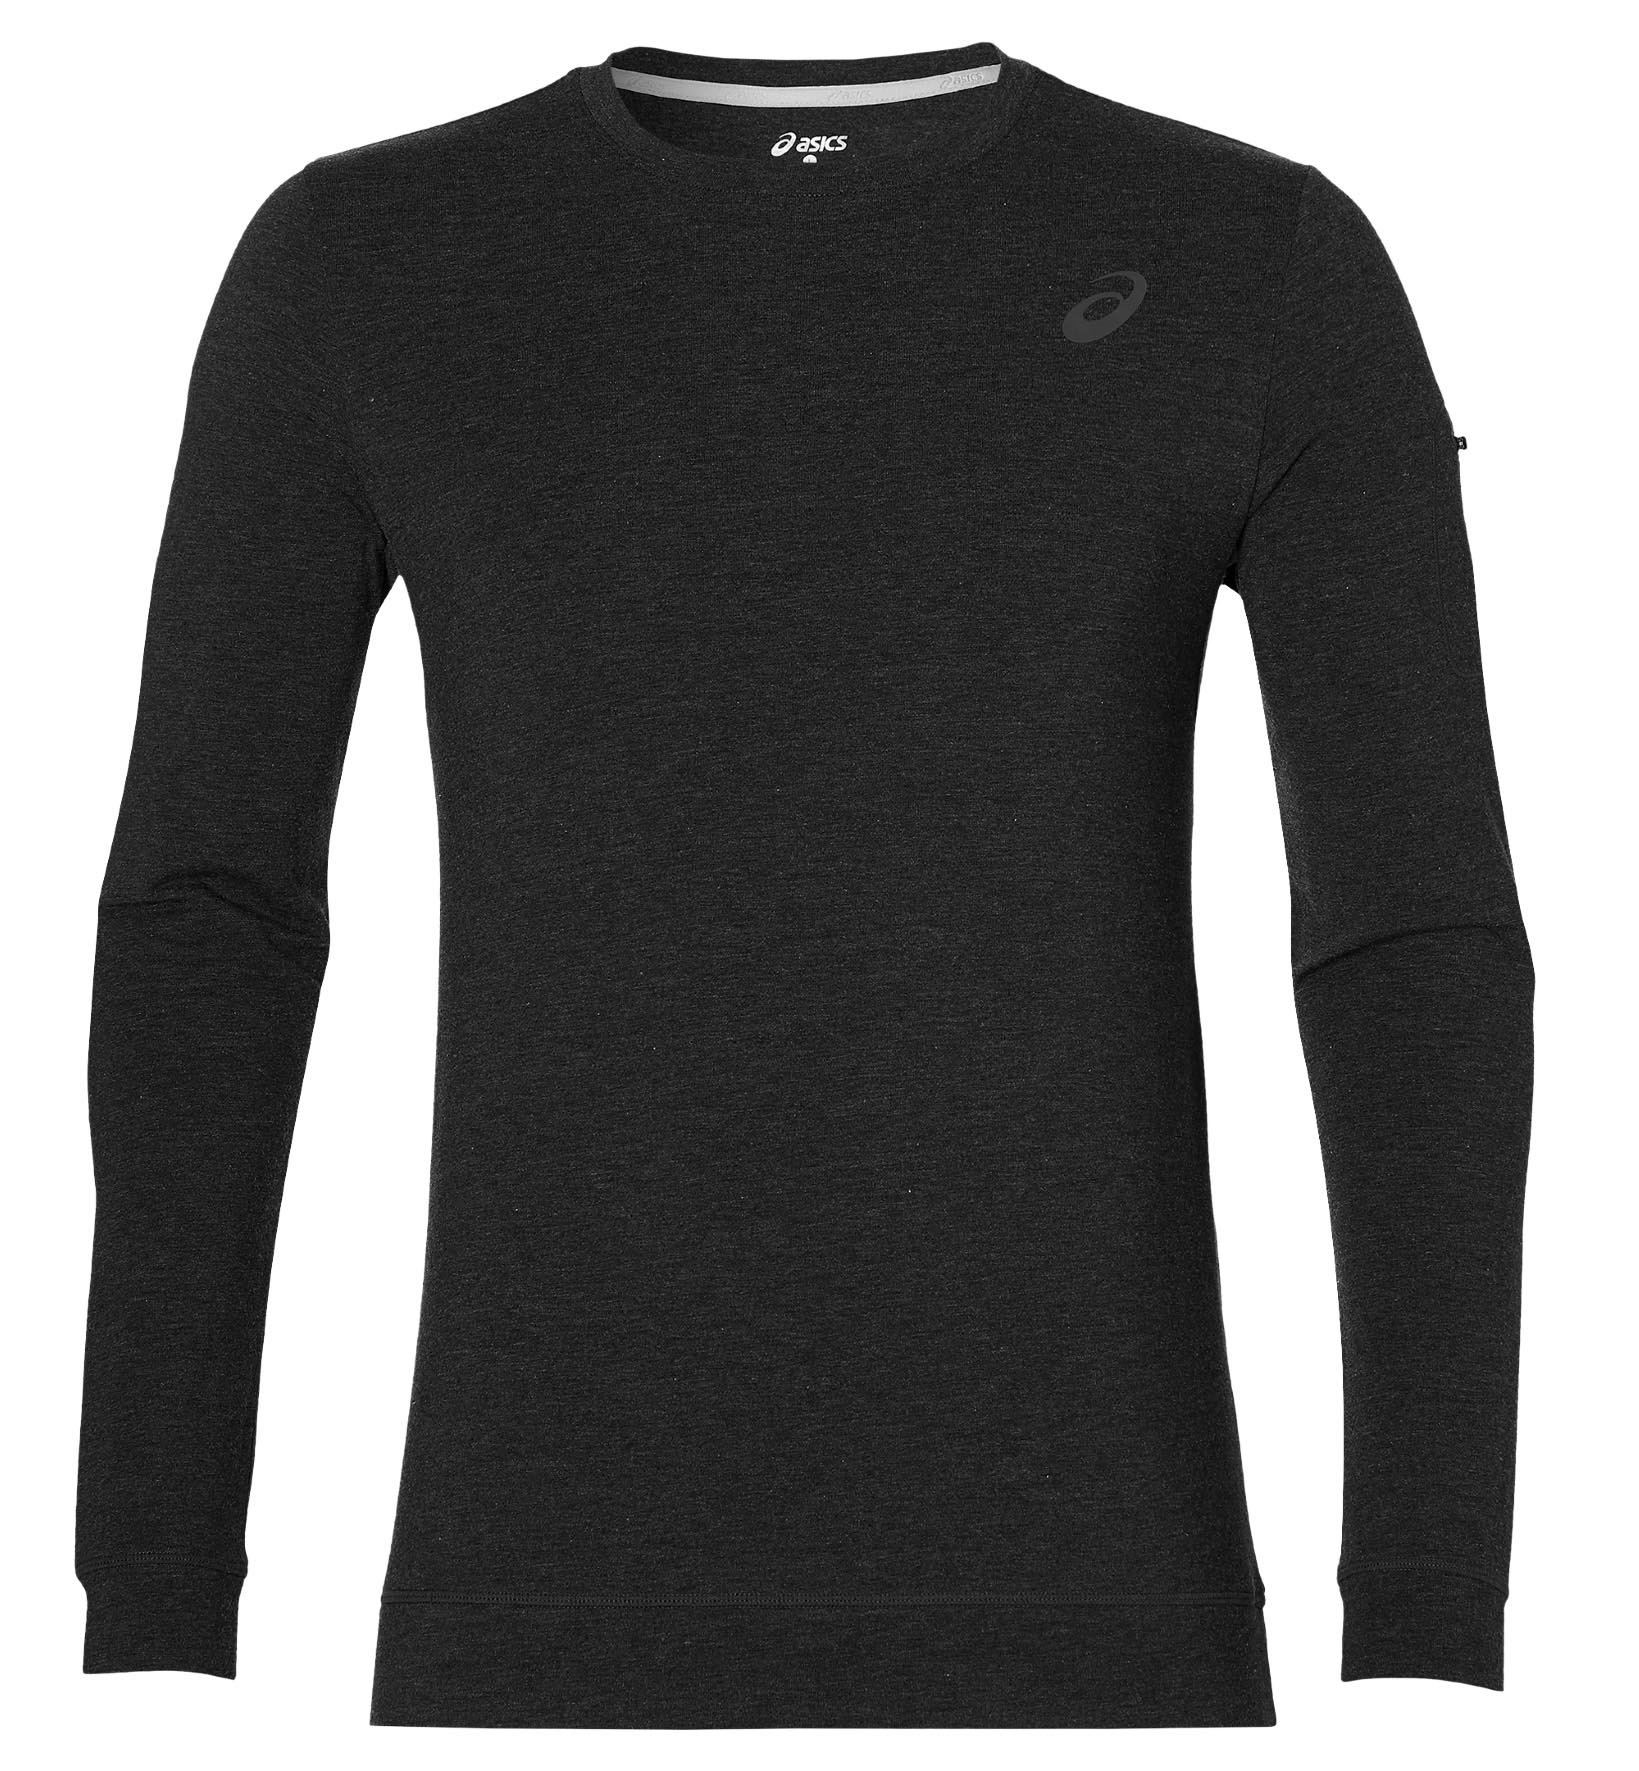 asics long sleeve grey shirts